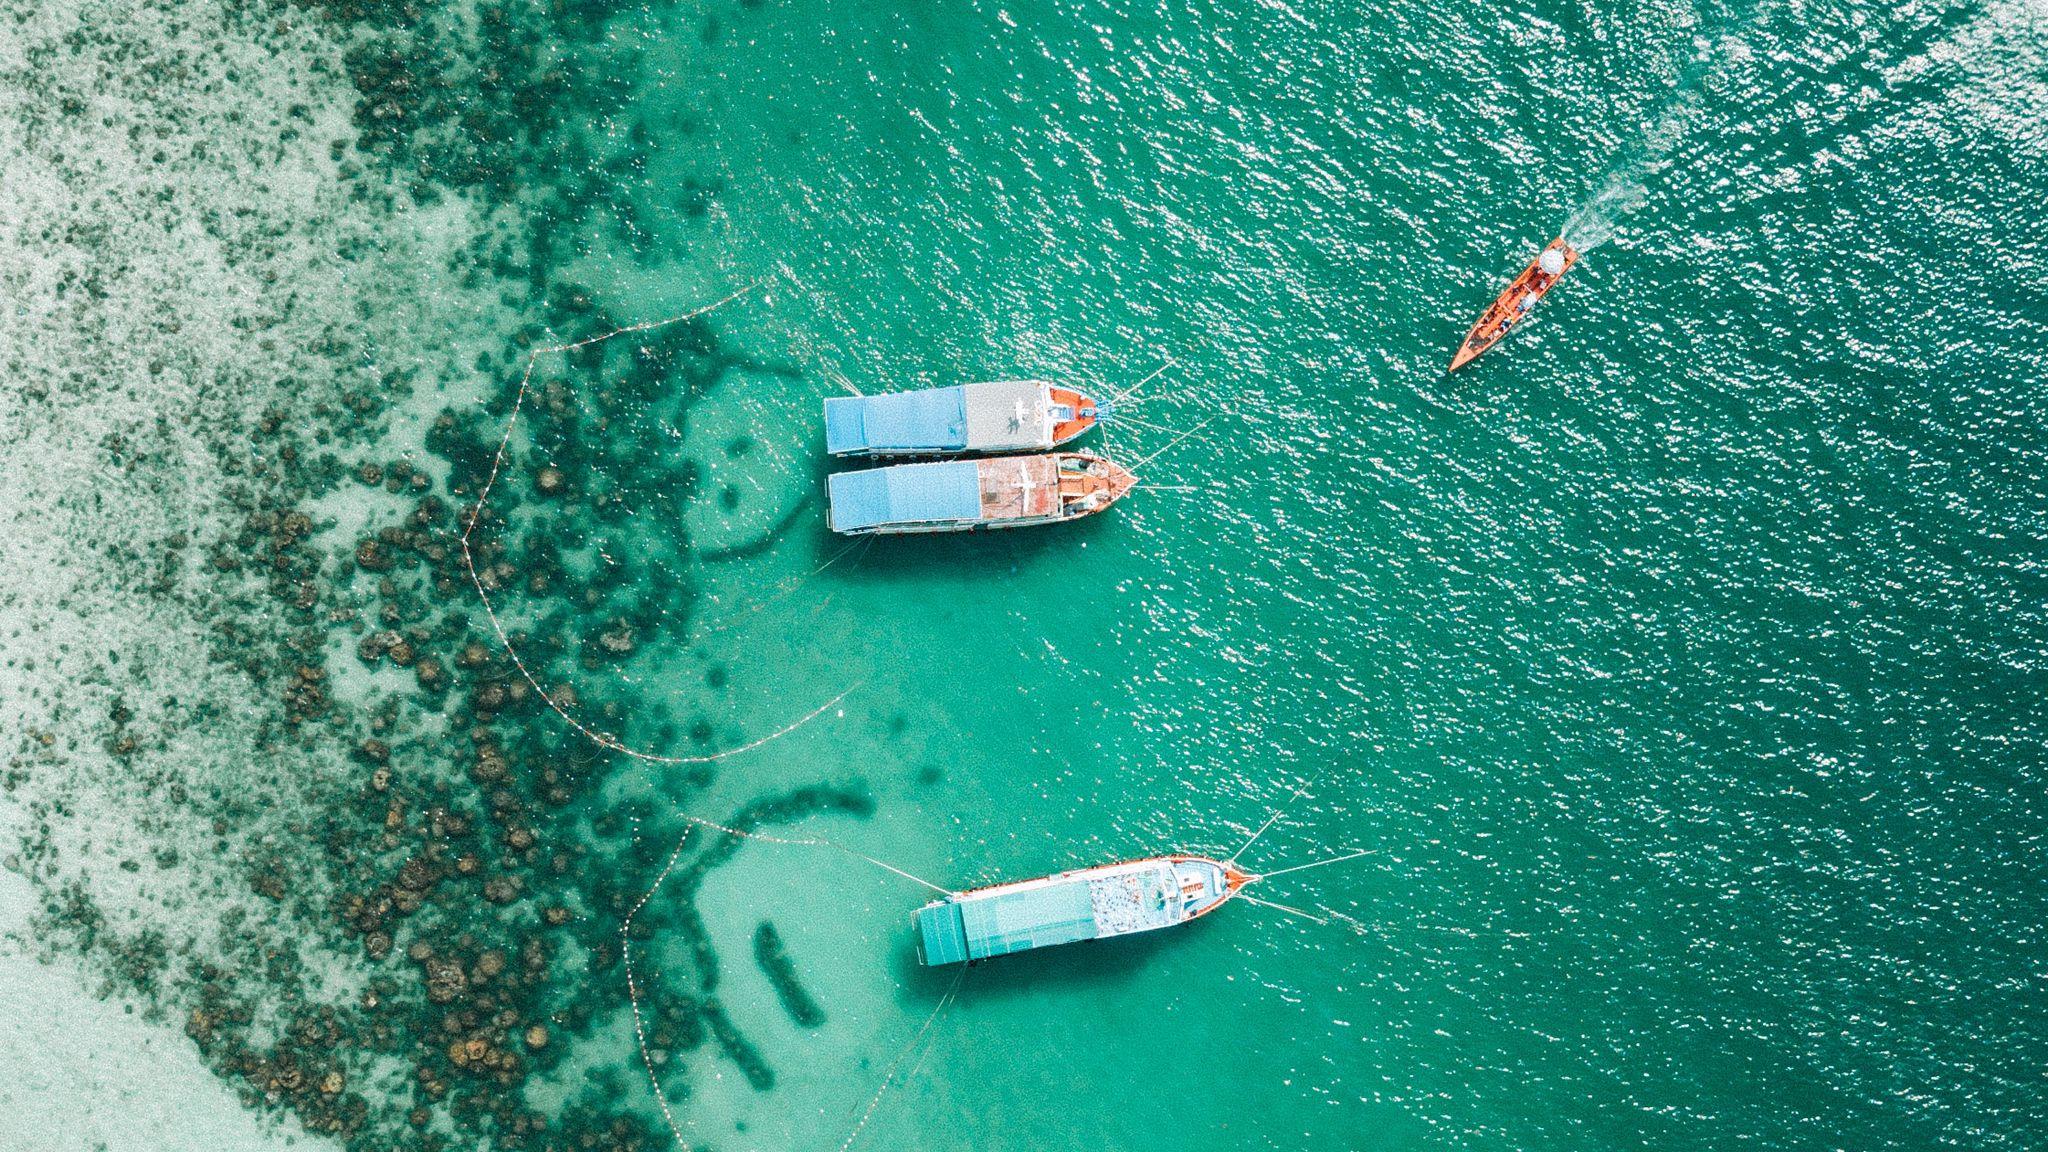 2048x1152 Wallpaper shore, boats, sandbar, ocean, moored, aerial view